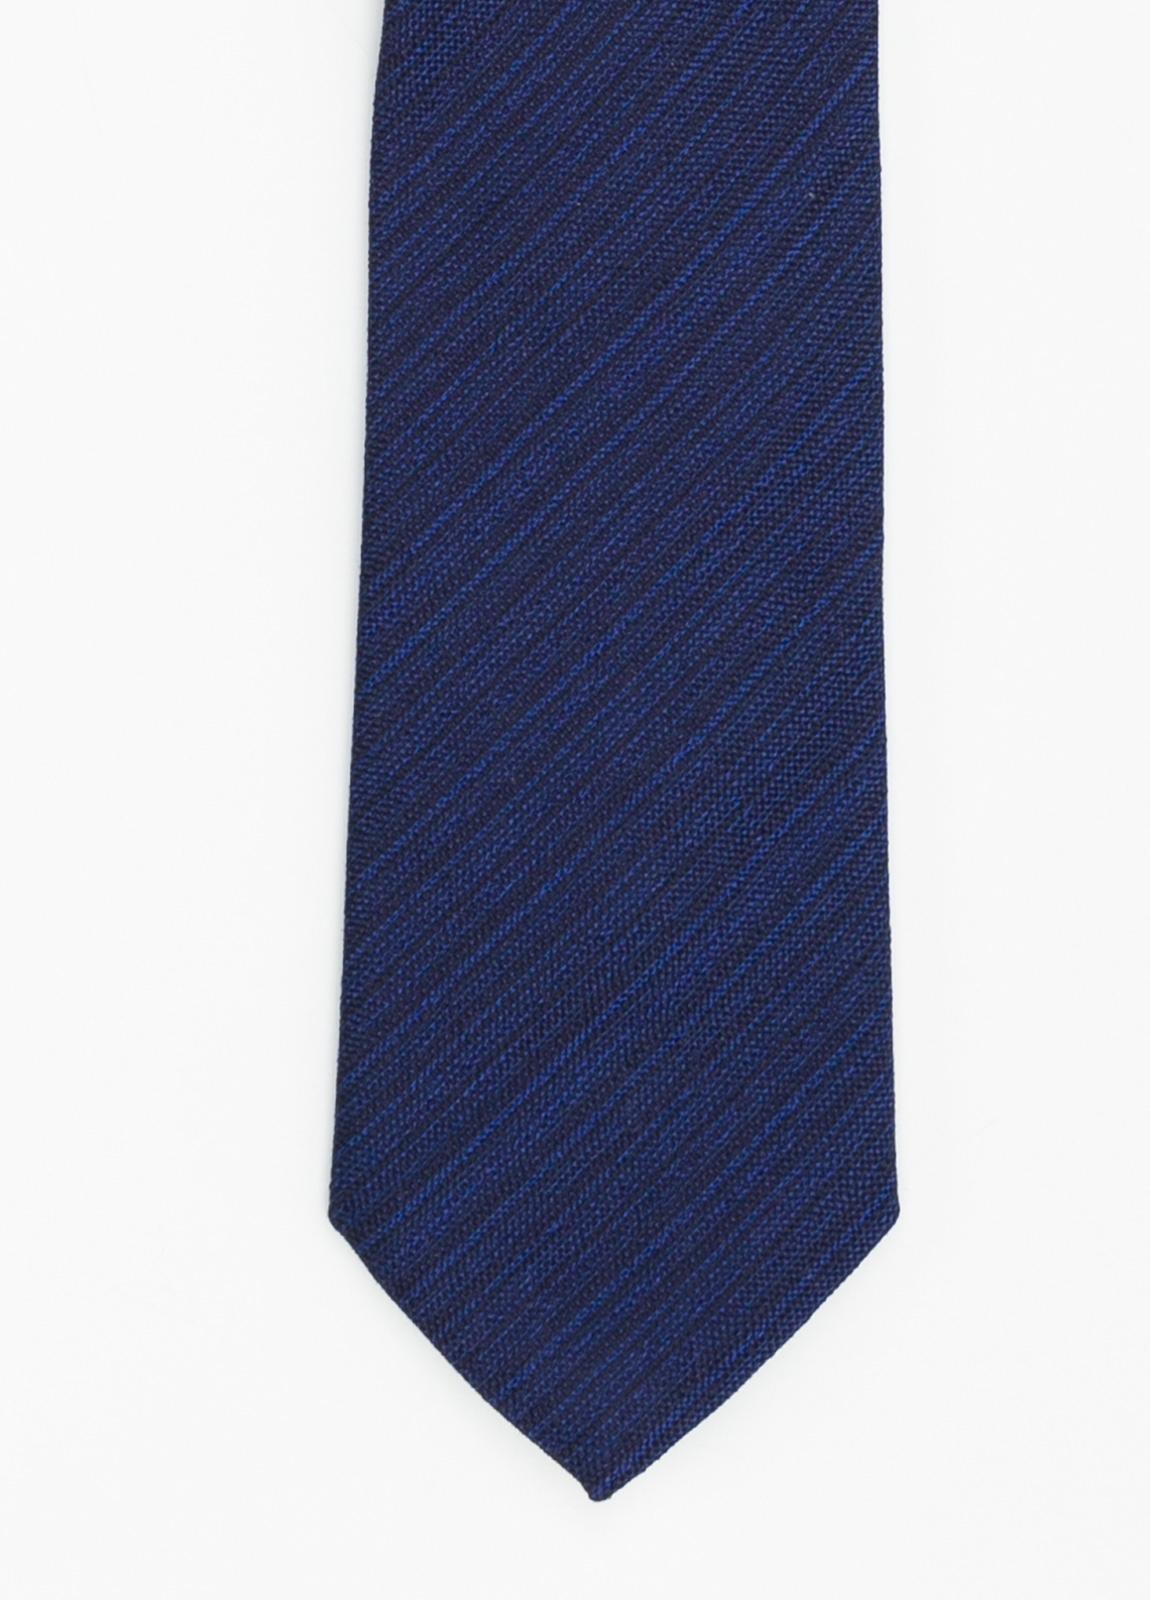 Corbata Formal Wear microtextura color azul tinta. Pala 7,5 cm. 96% Seda 4% Algodón.